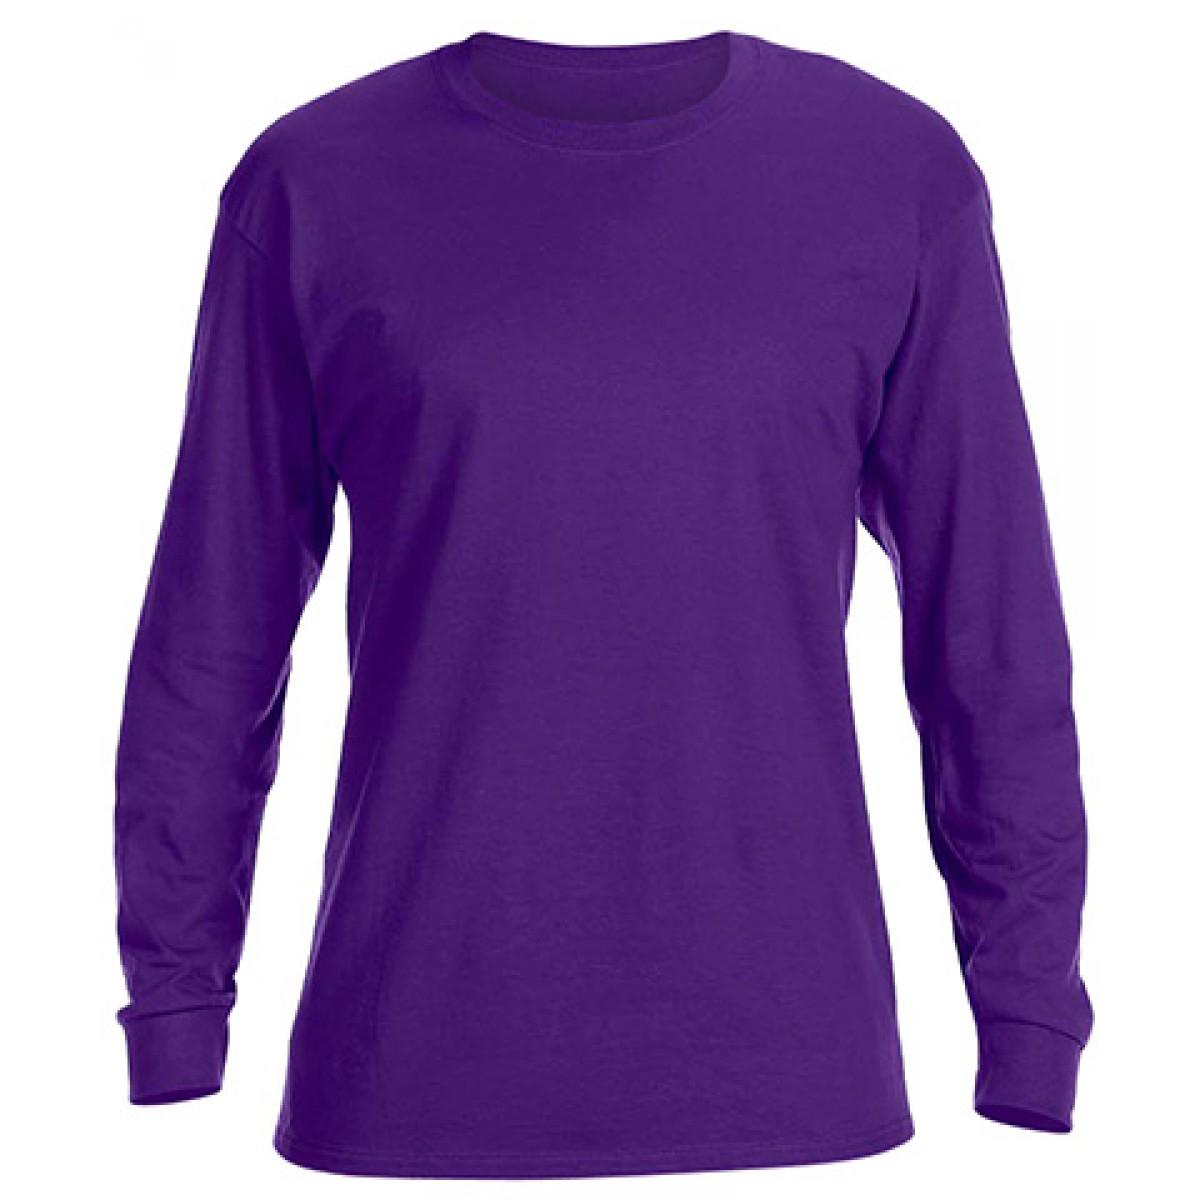 Basic Long Sleeve Crew Neck -Purple-L